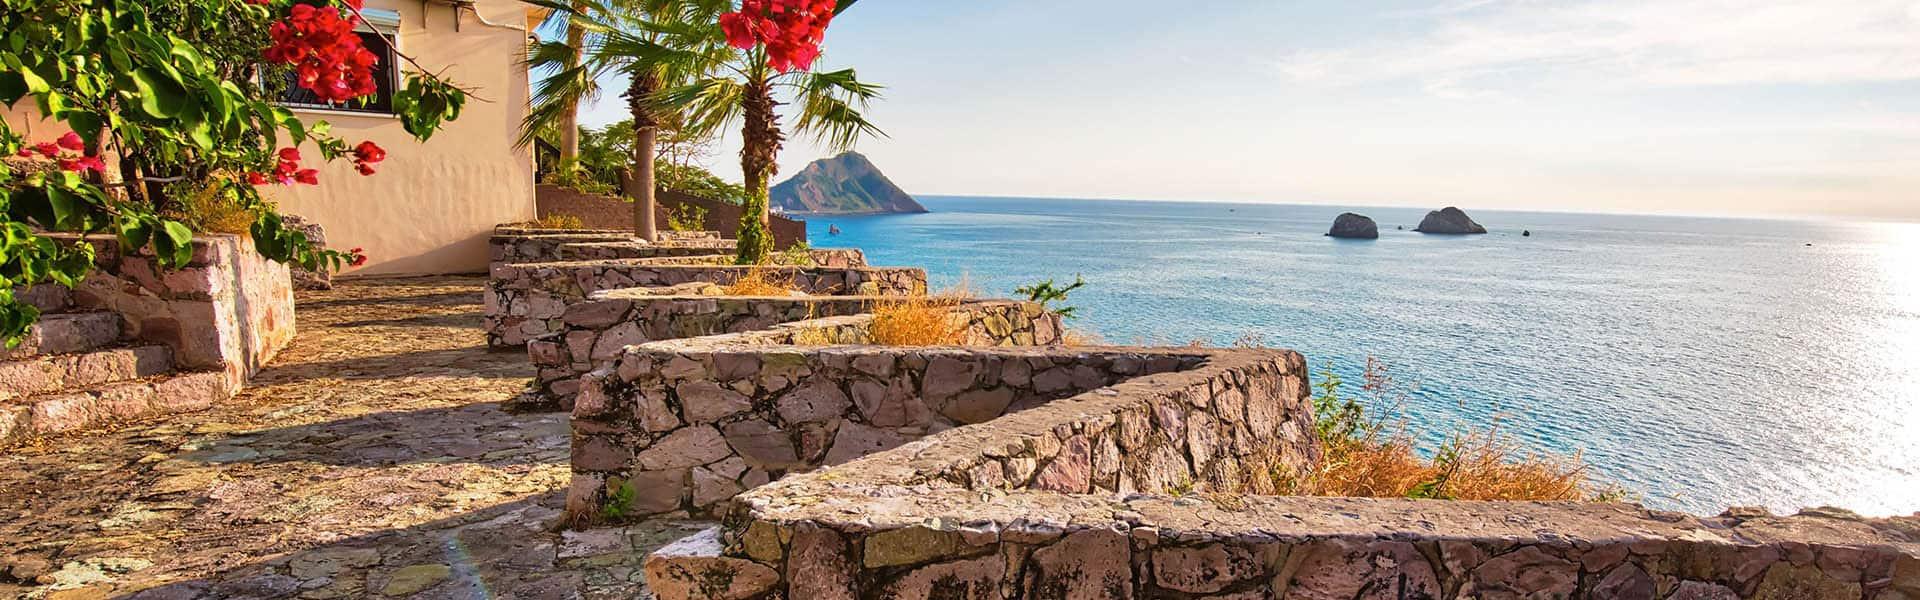 Mexican Riviera: San Diego & Cabo